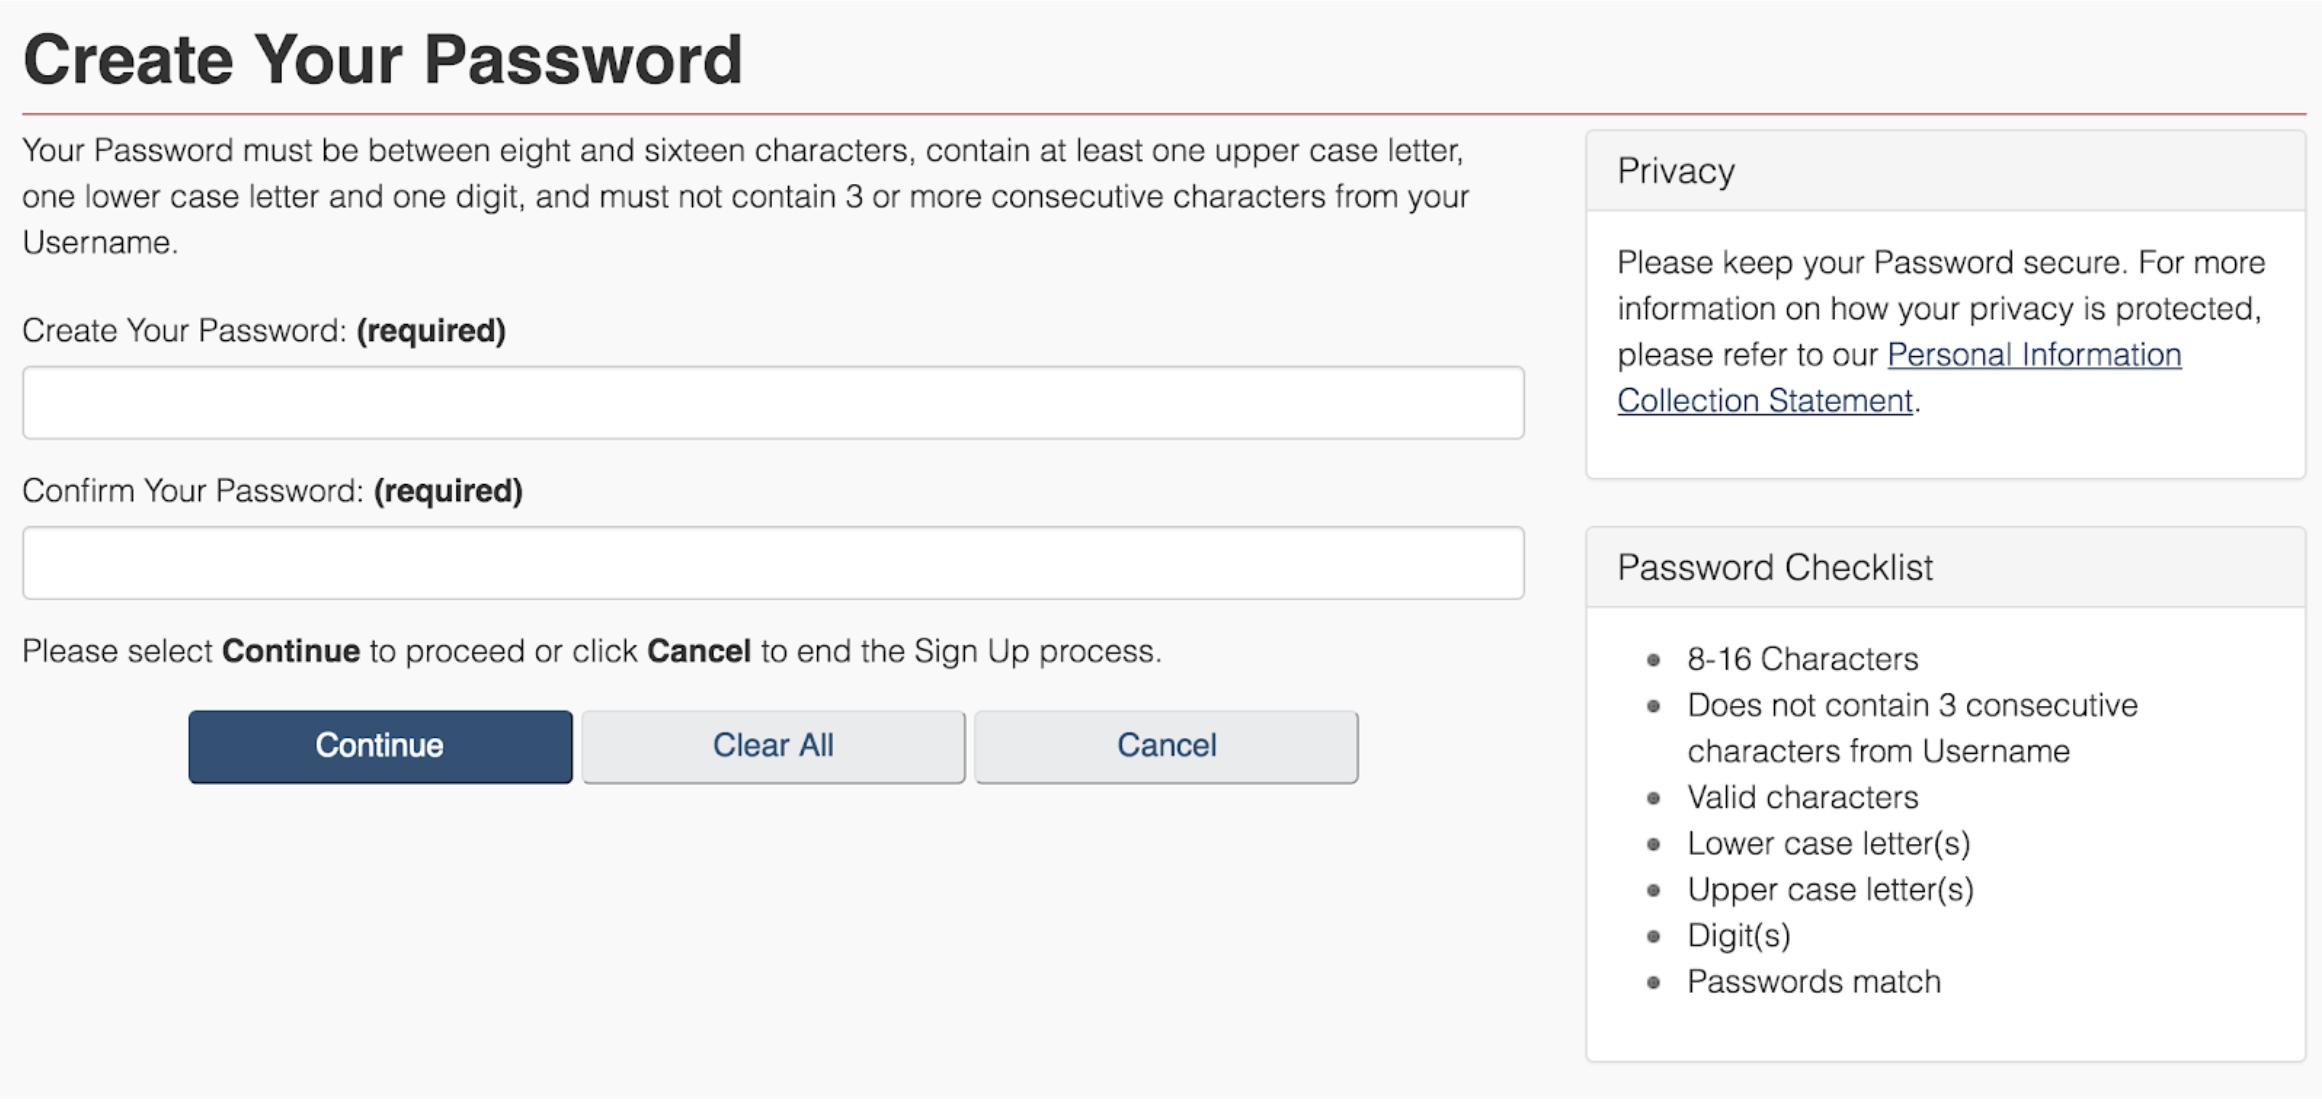 Creating-password-Tutorial-IEC